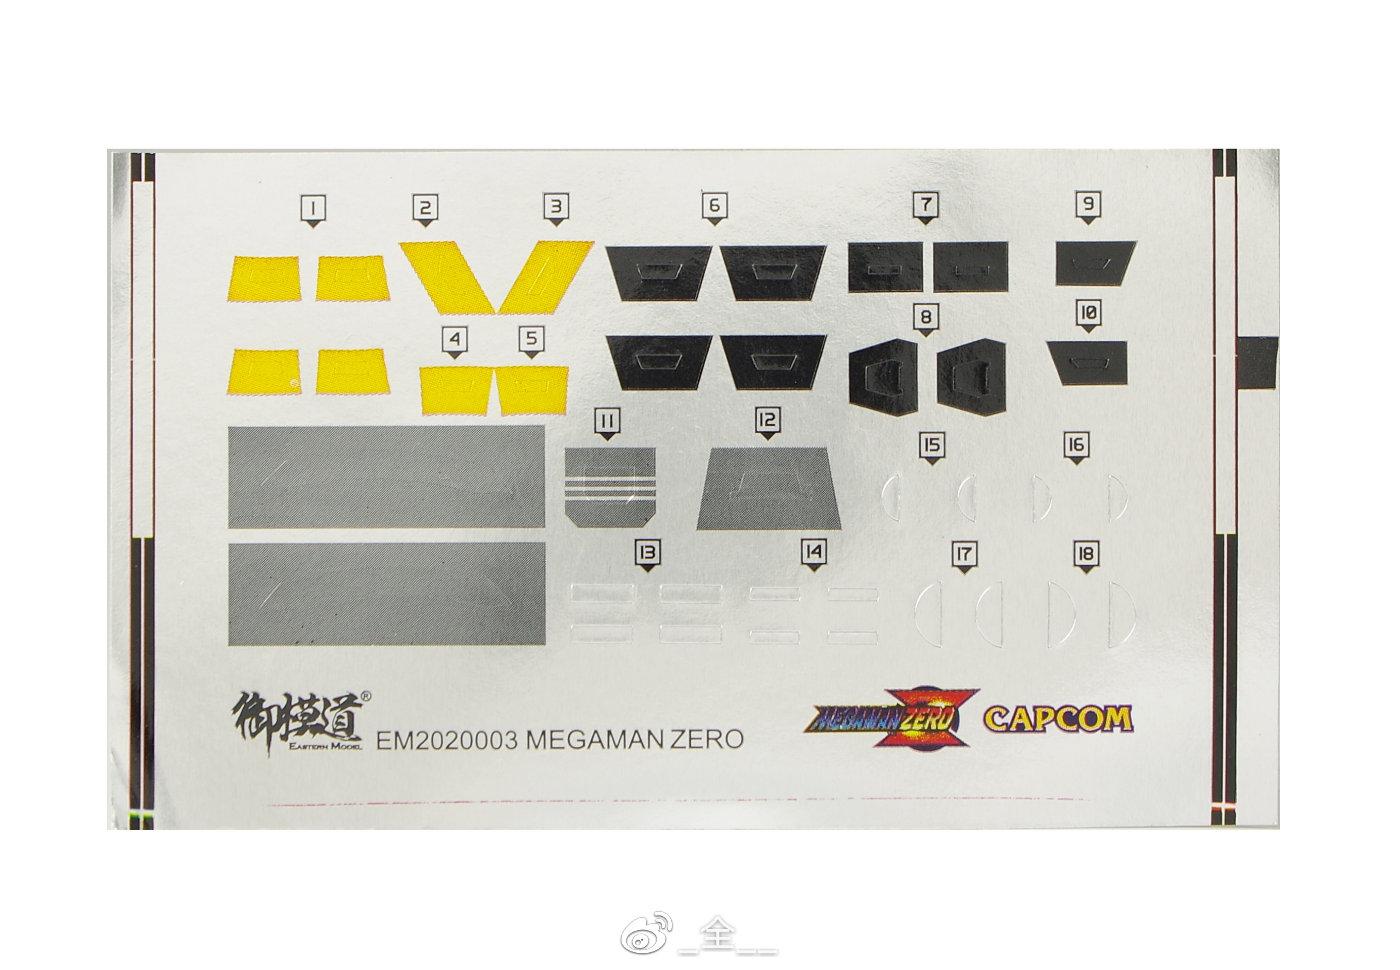 S402_e_model_ZERO_CAPCOM_029.jpg